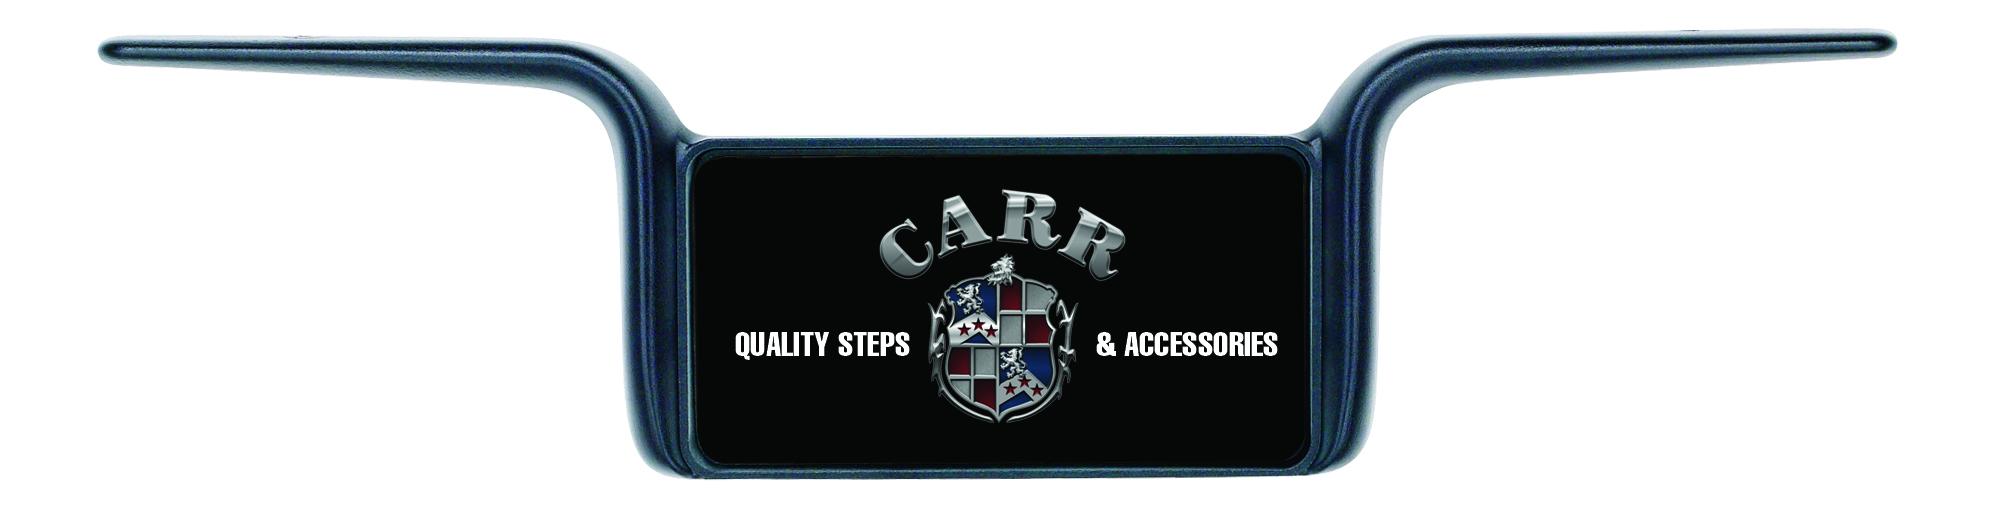 Carr Light Wing XP3 Black Pow der Coat